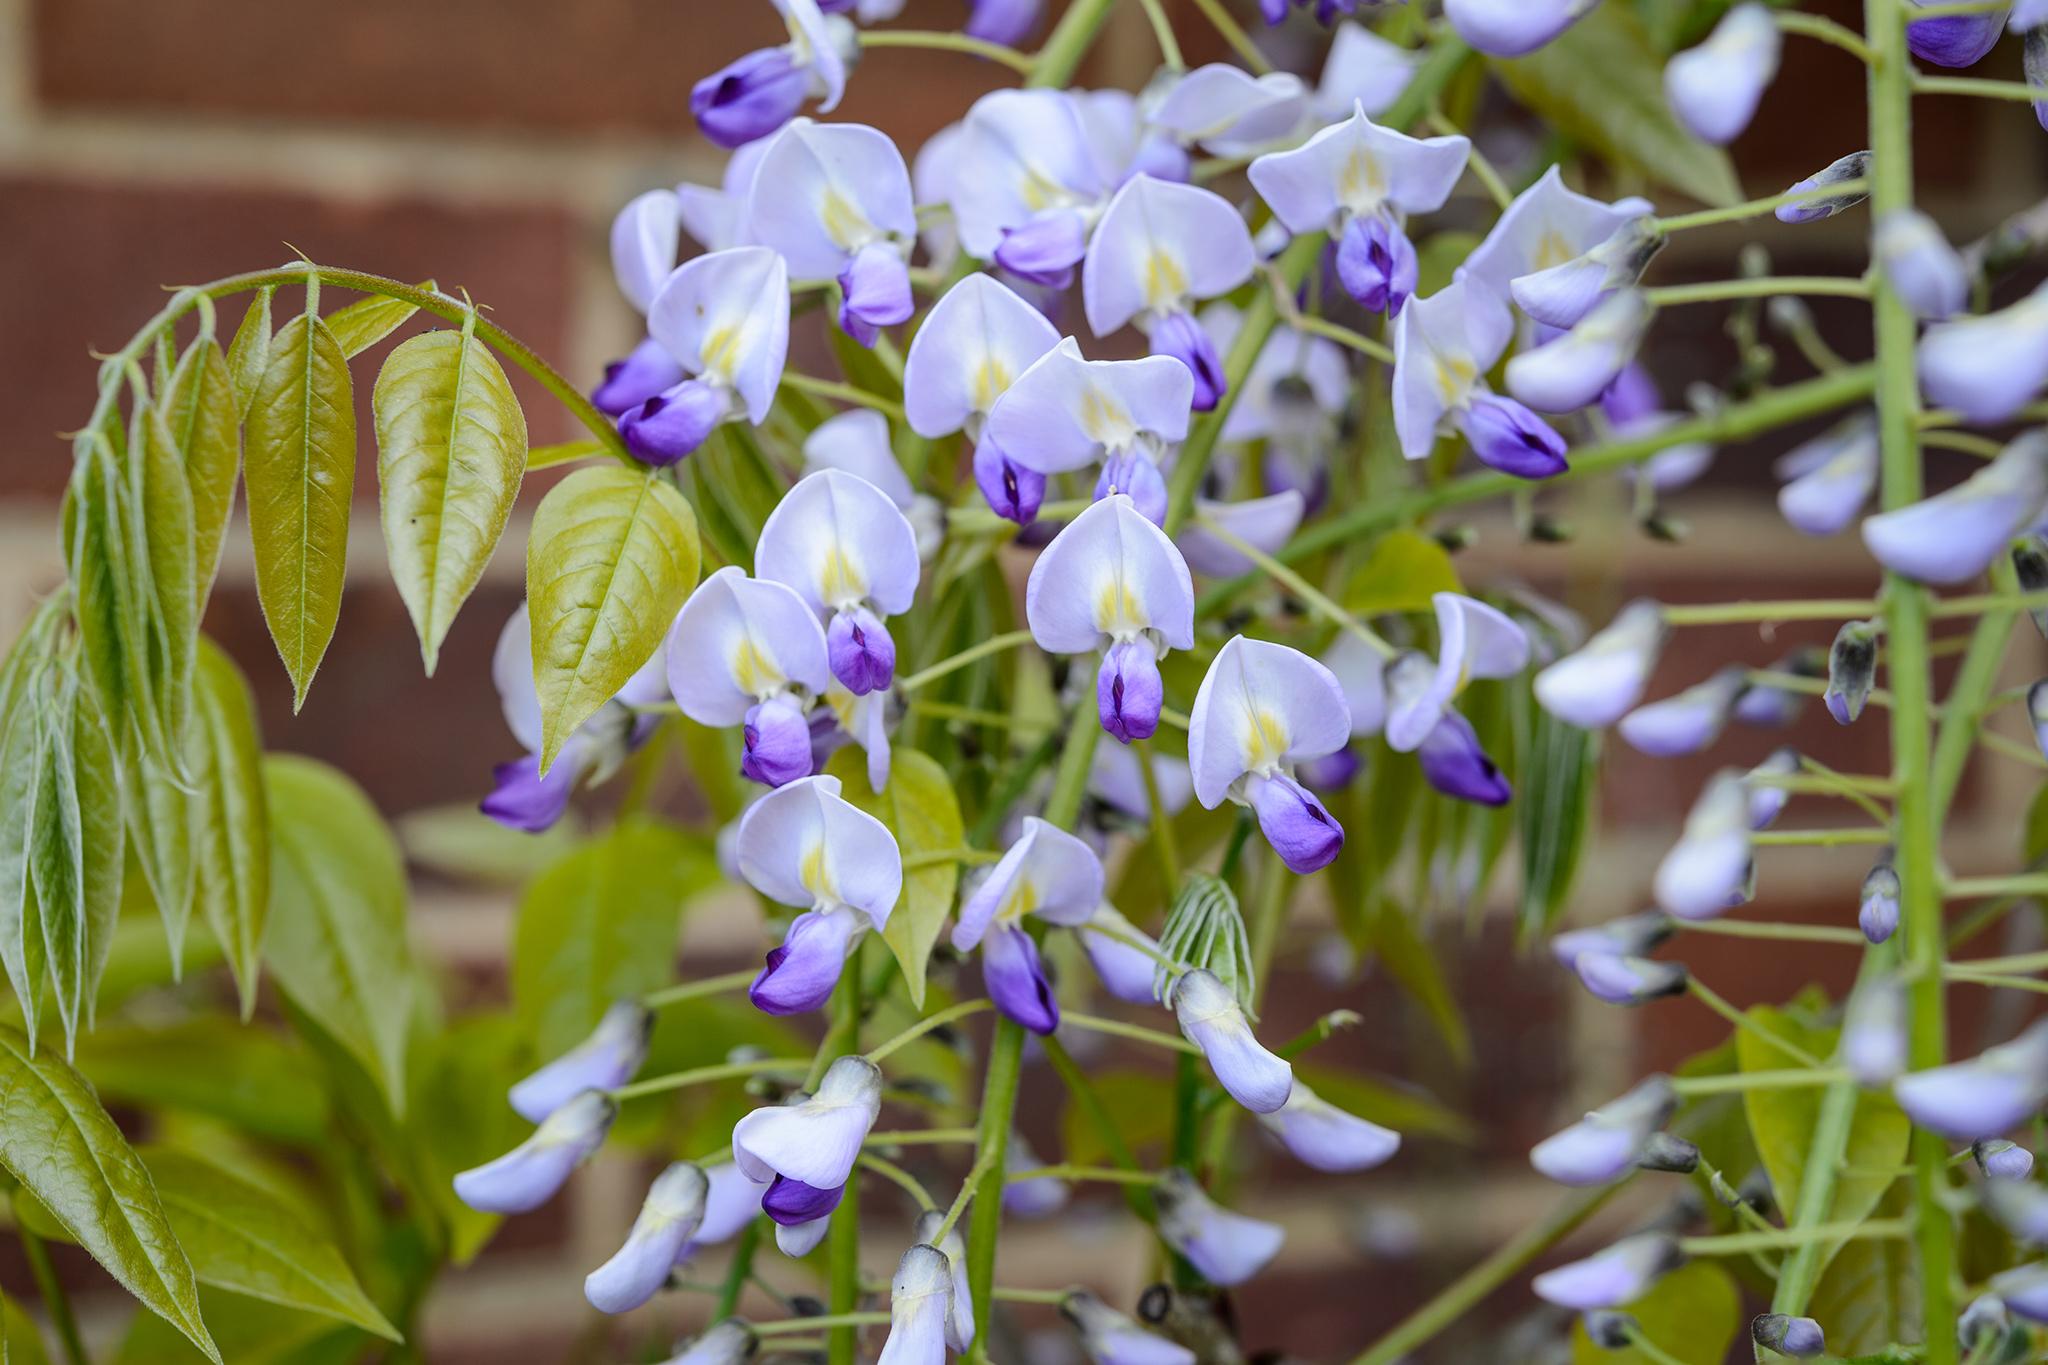 night-scented-plants-wisteria-floribunda-2